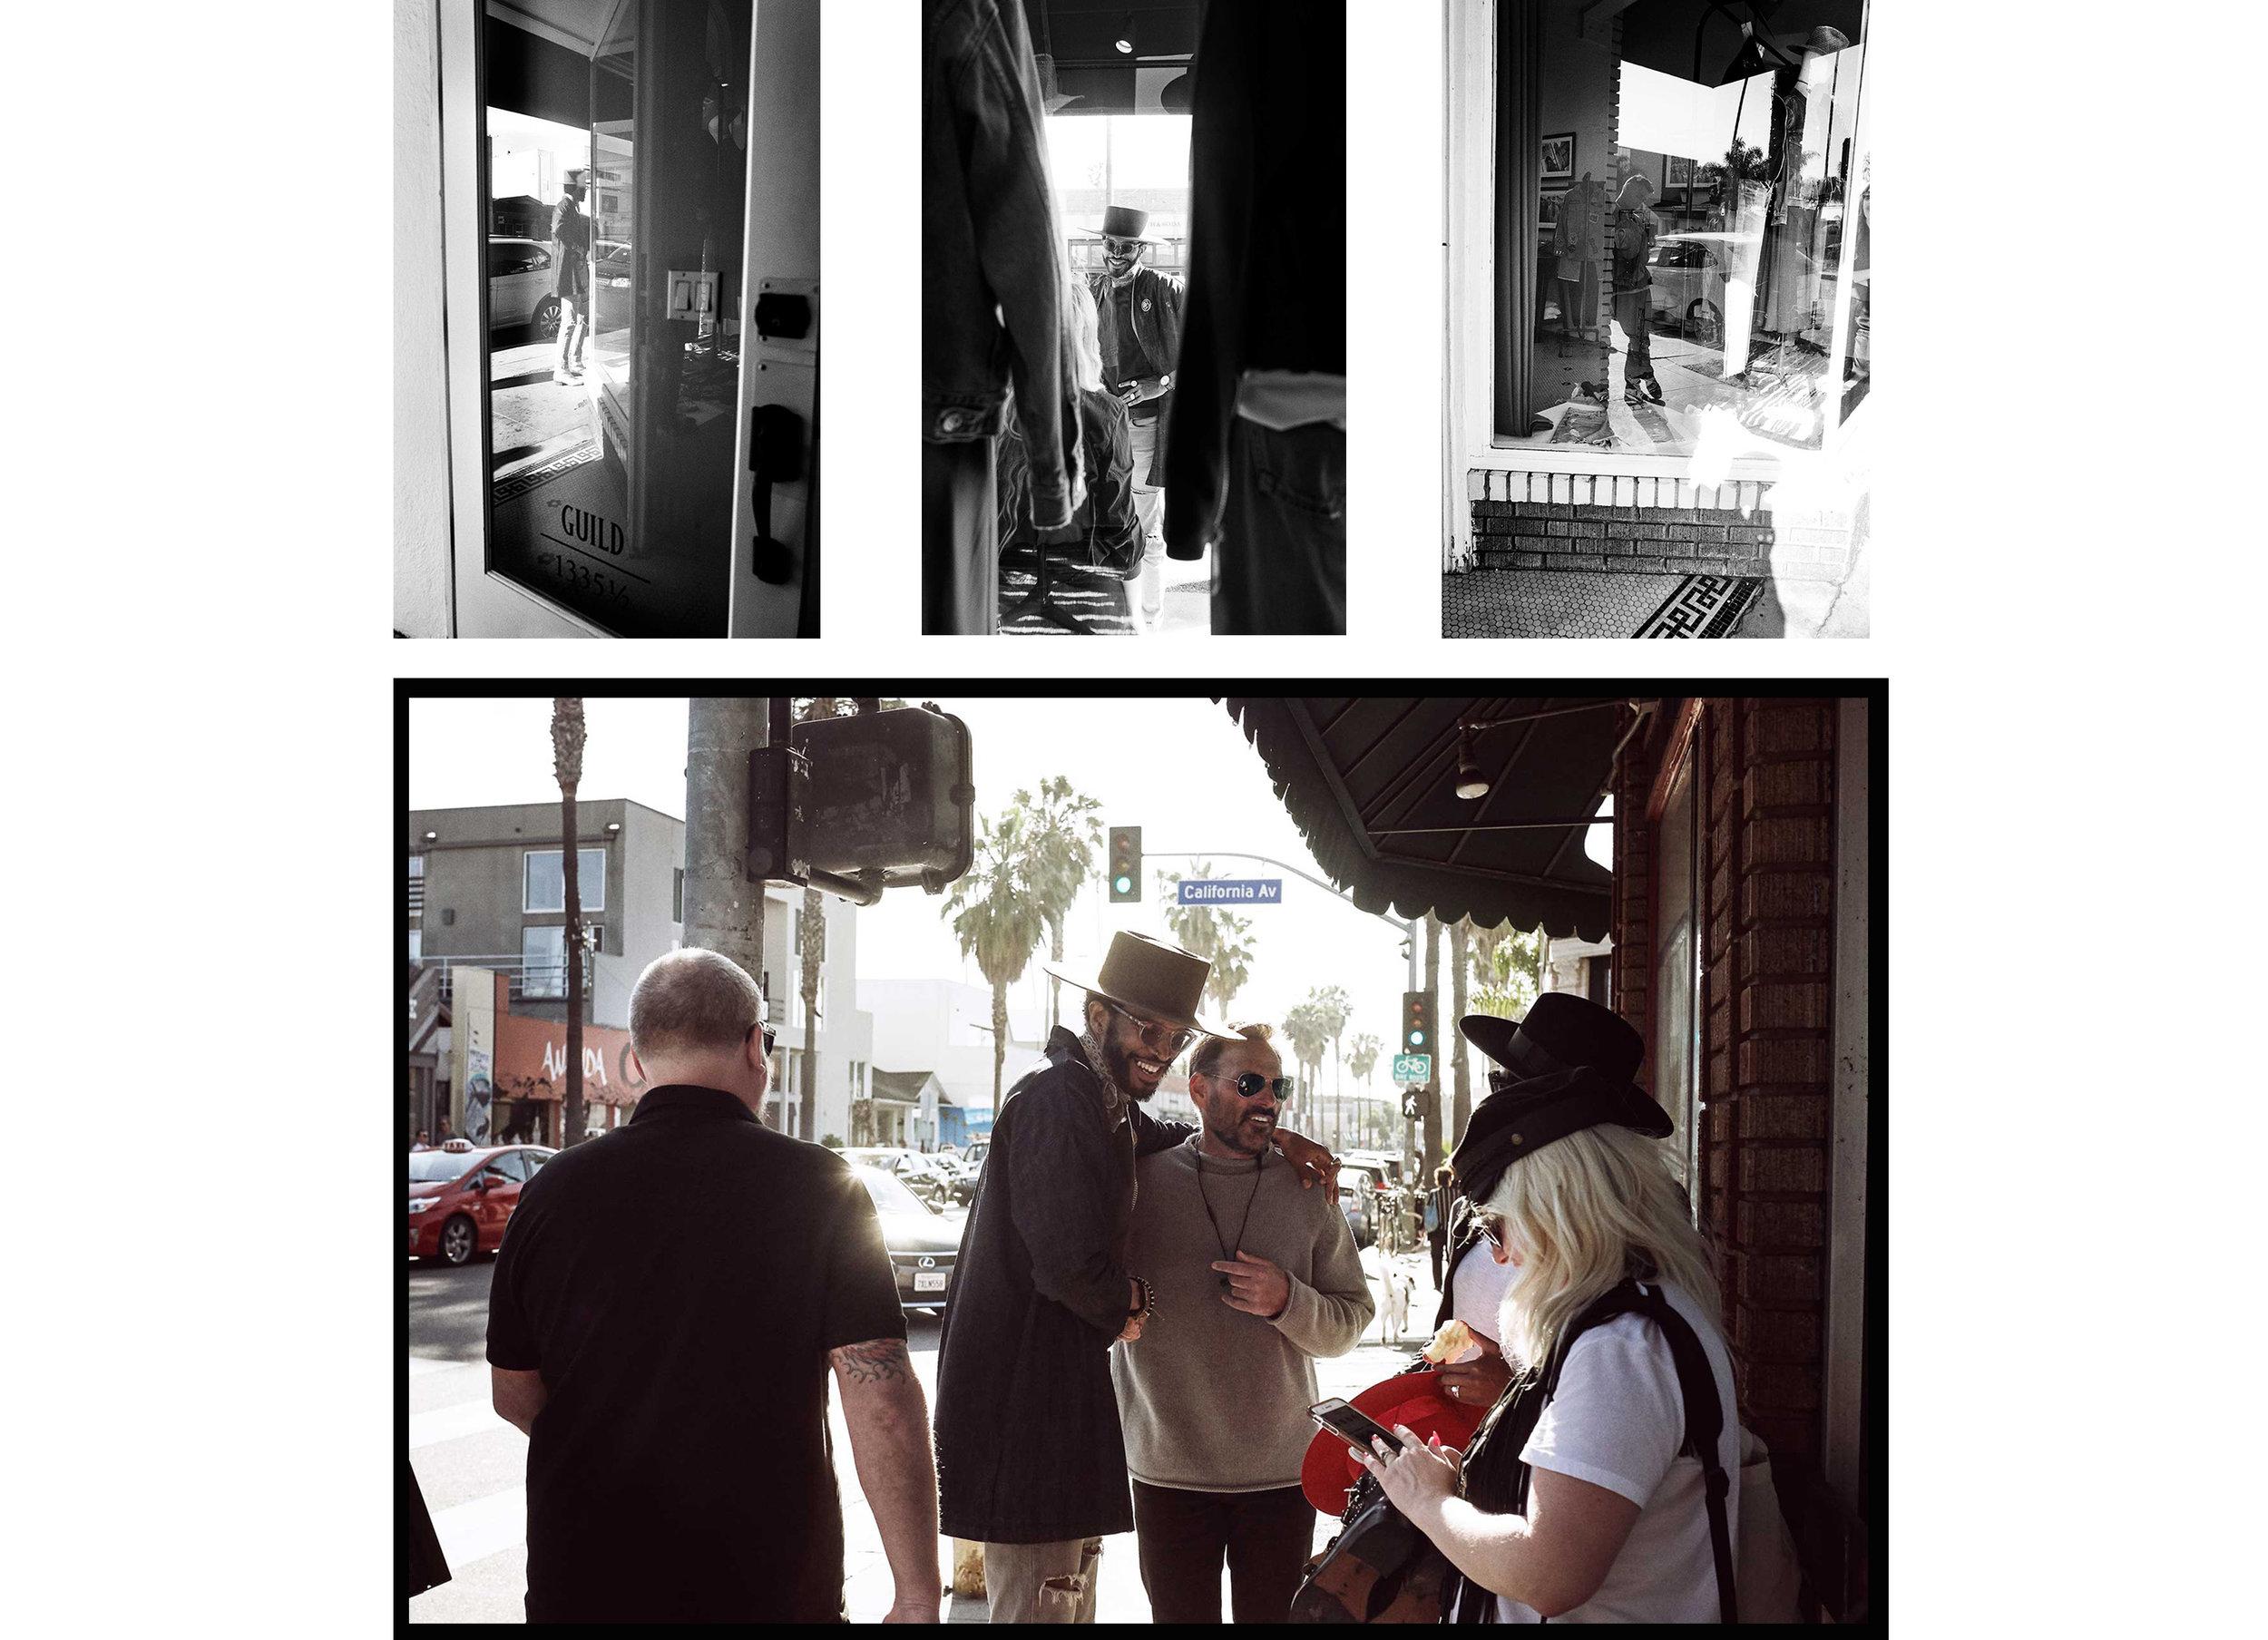 michael-scott-slosar-emmett-skyy-la-street-stories-8.jpg